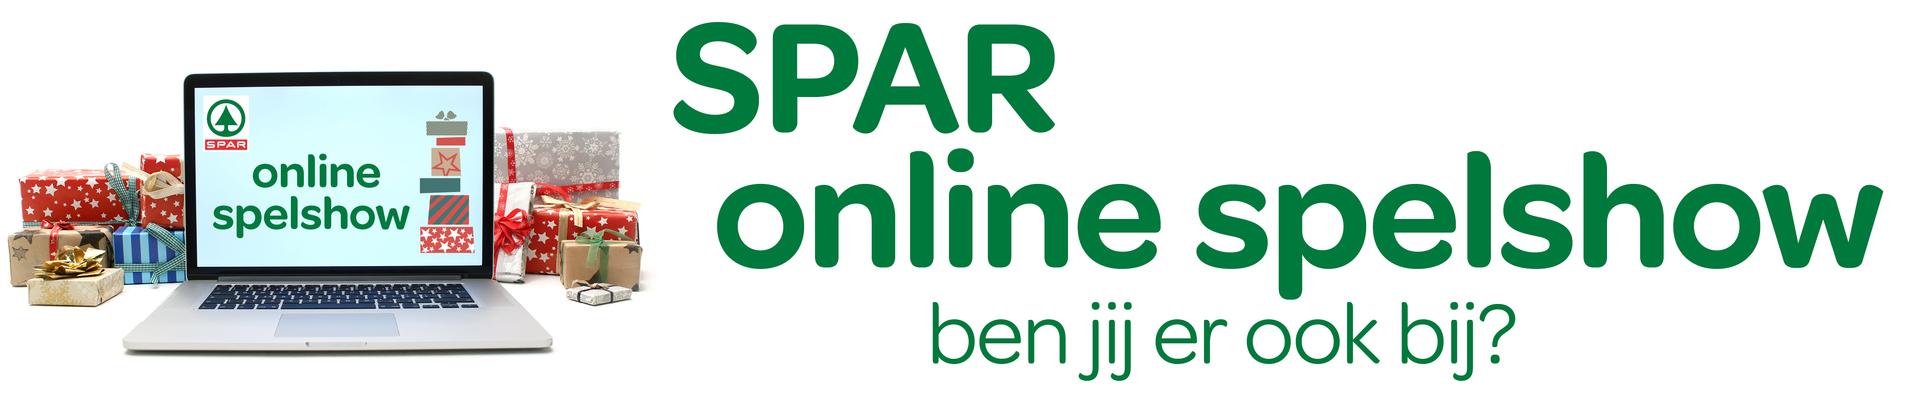 SPAR online spelshow